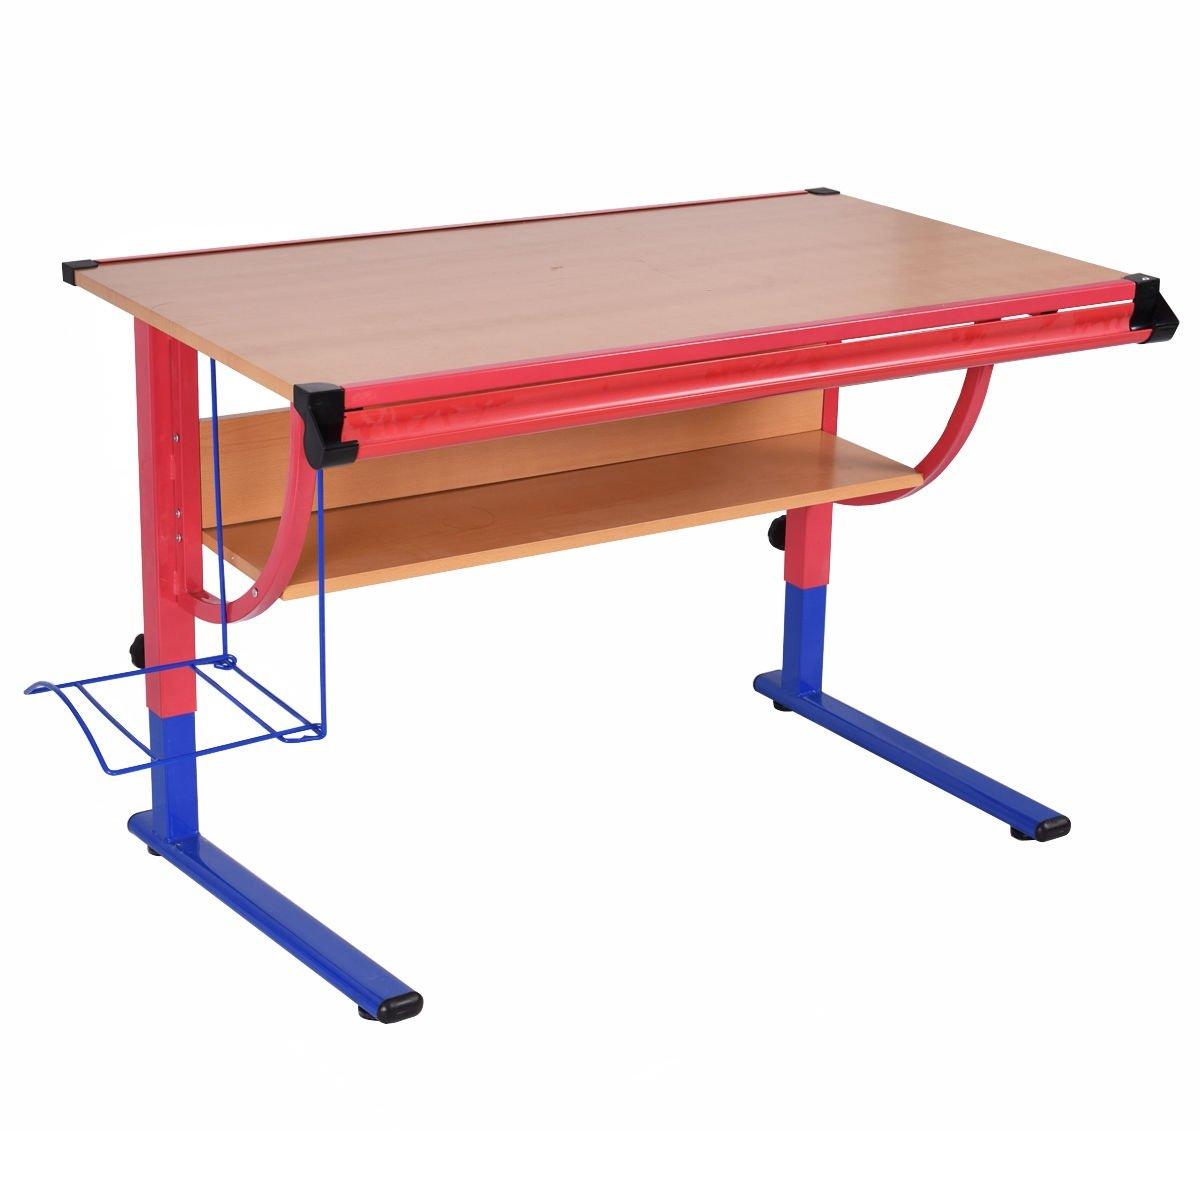 NEW Adjustable Drafting Table Workstation Drawing Desk Art & Craft Hobby Studio Wood Iron